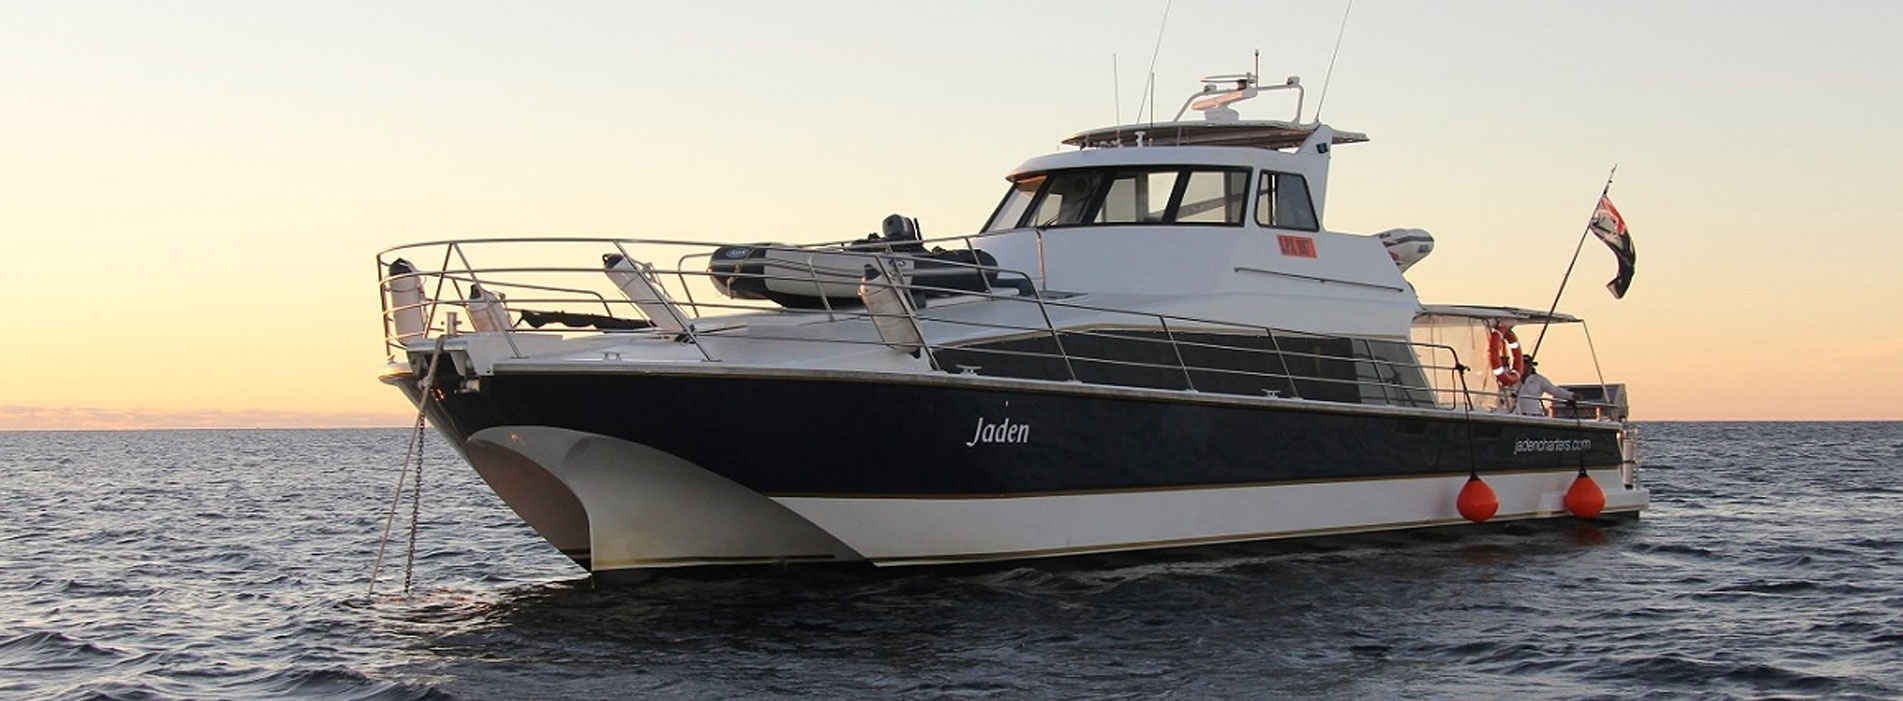 JADEN-Boat-charters-perth-wa copy